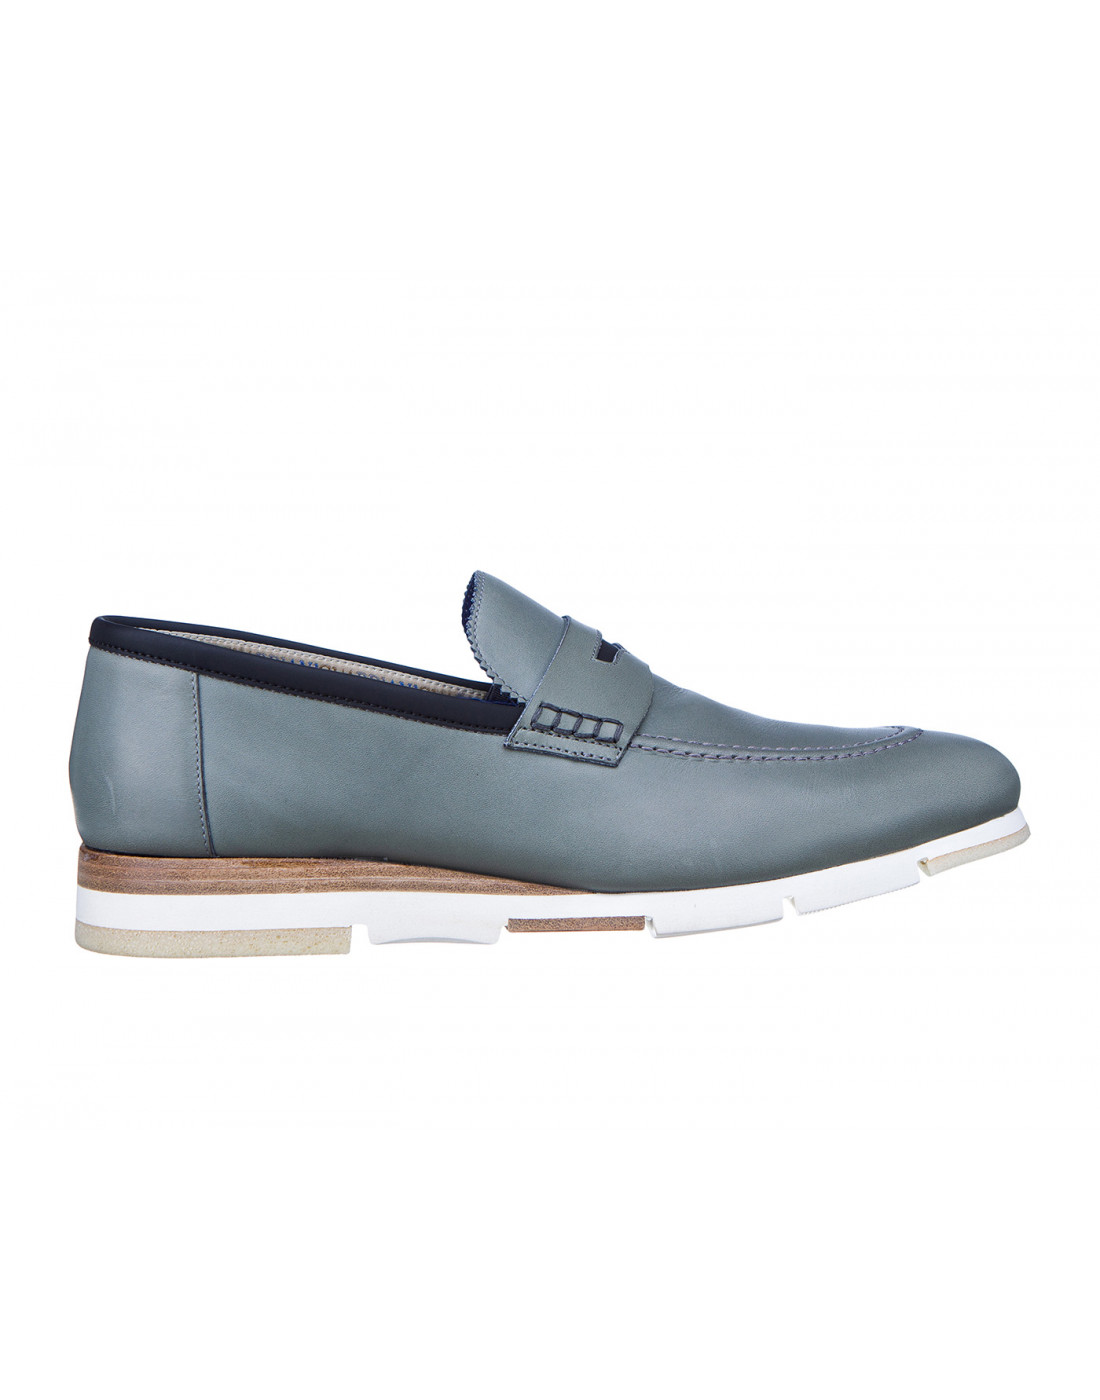 Туфли серые мужские A.Guardiani S76032S-1